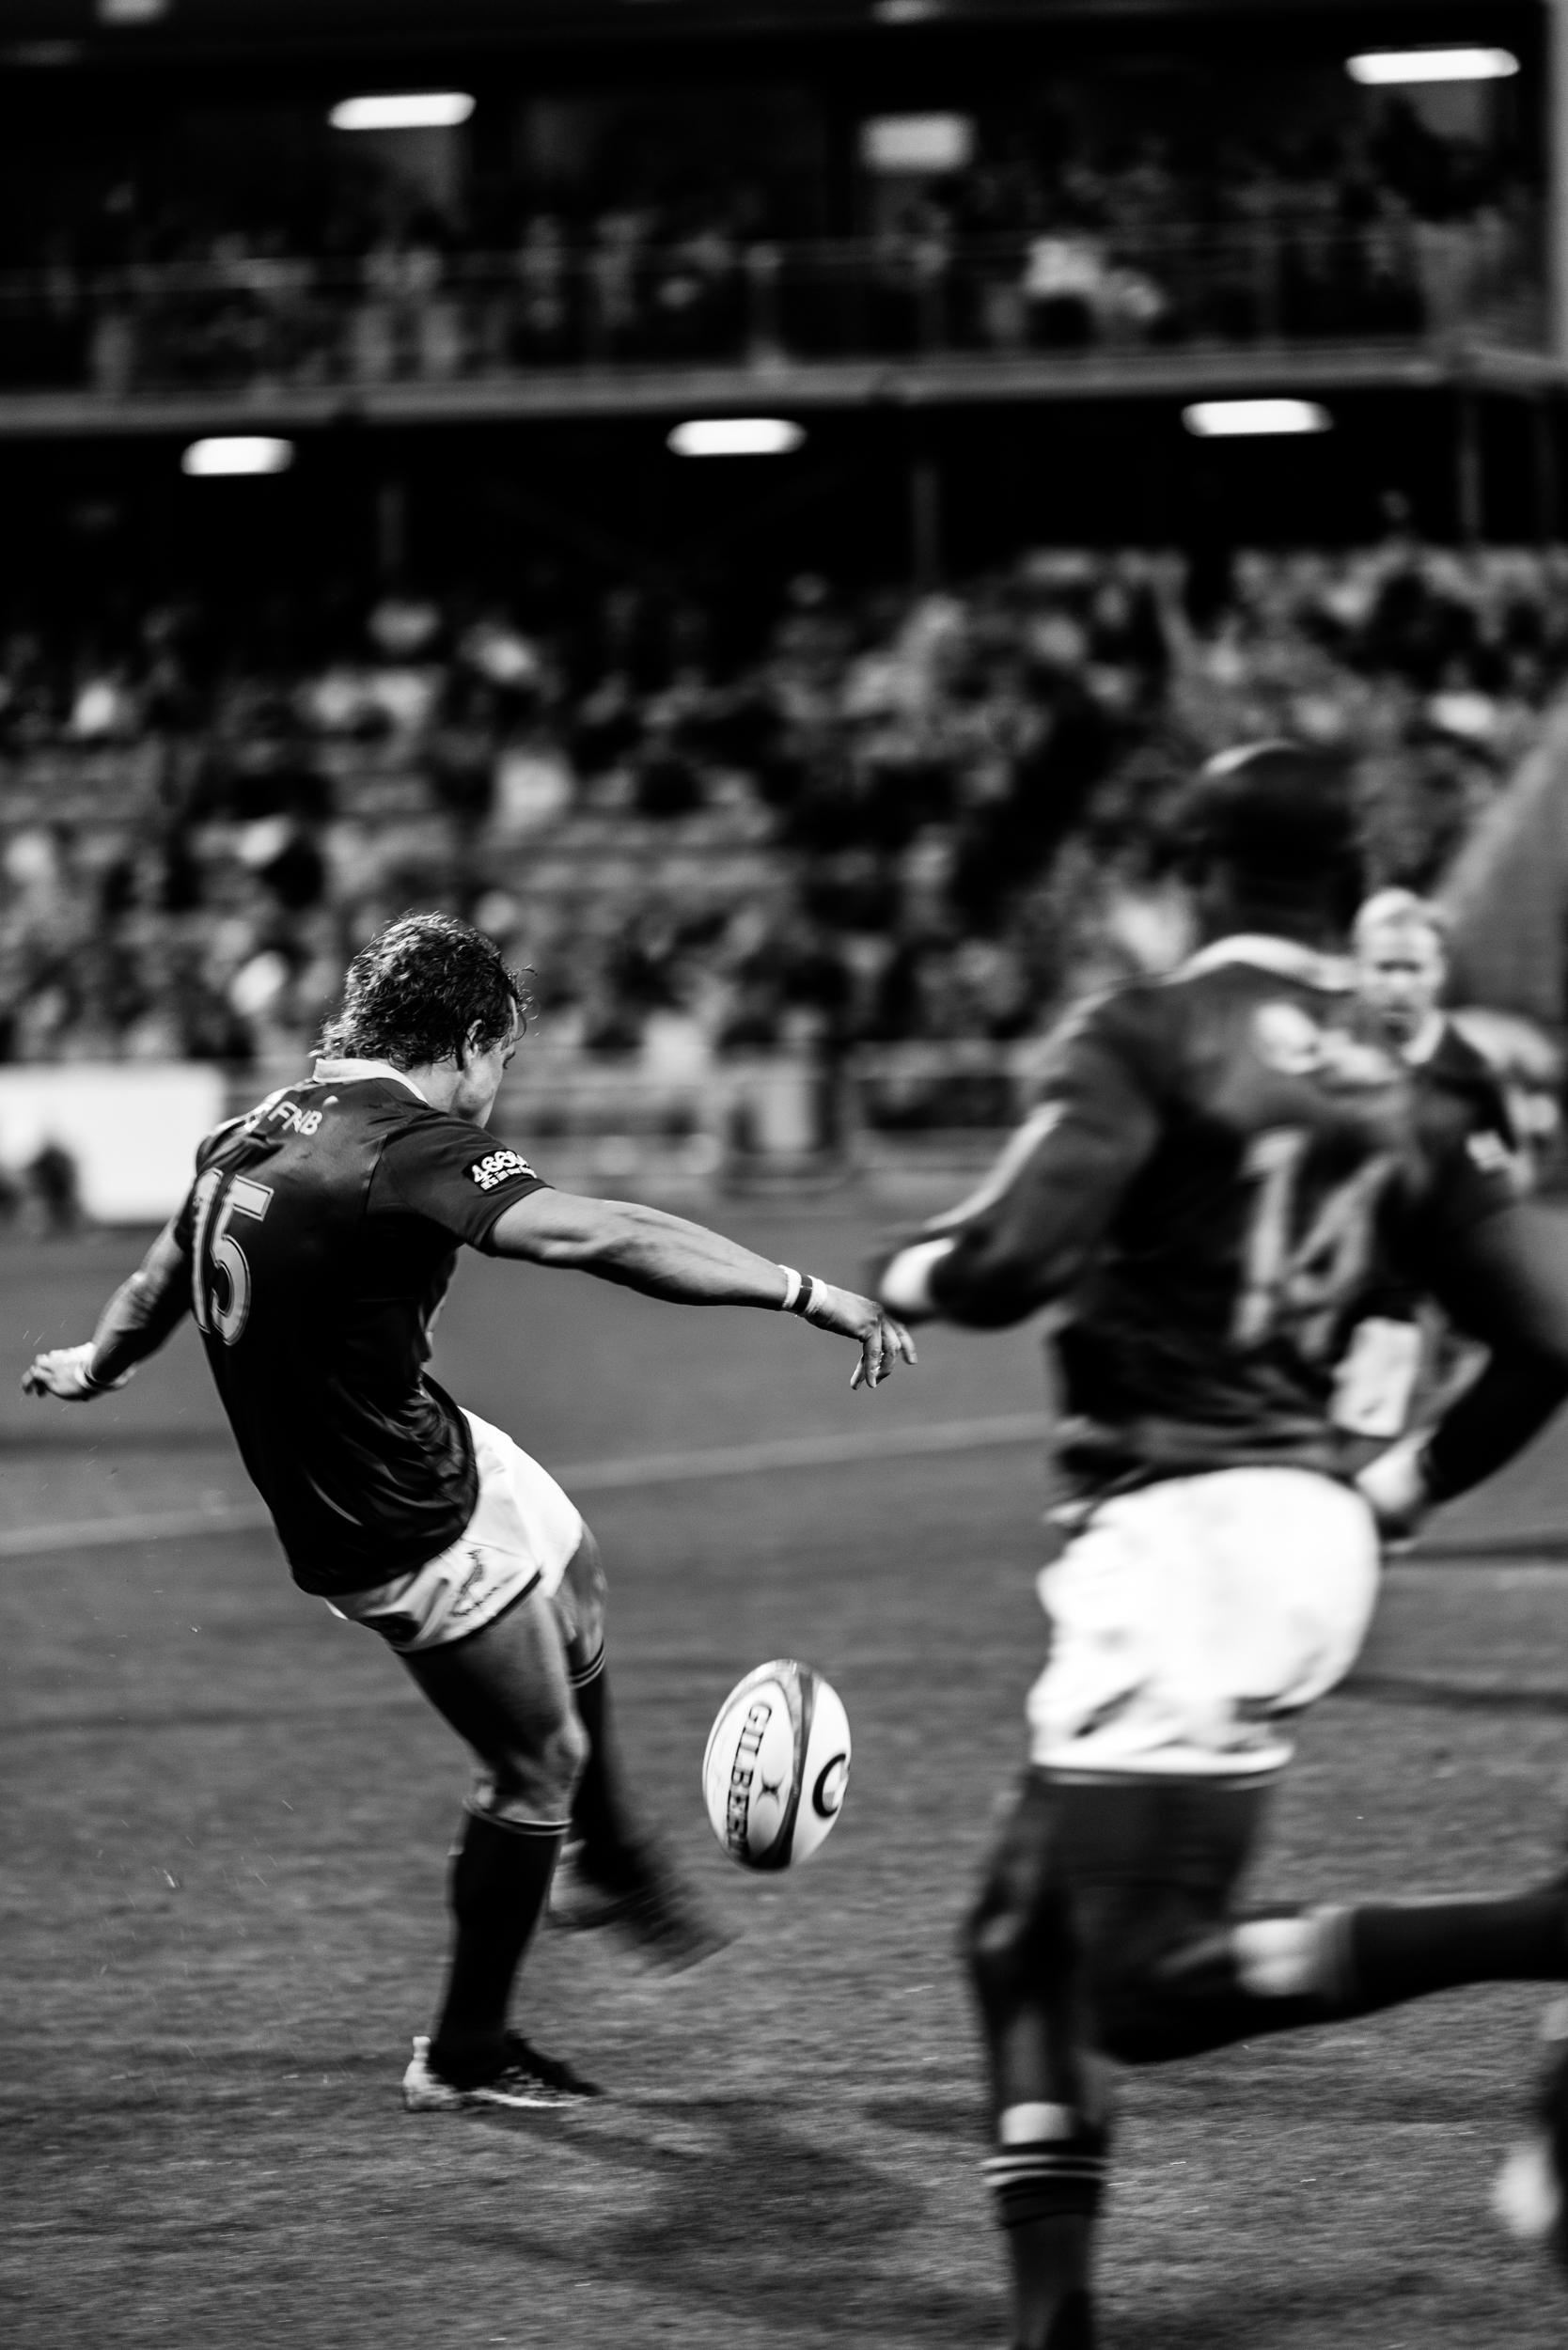 Spyrides_Kyle_RugbyChampionship_Perth_9.9.2017_DSC7232.jpg